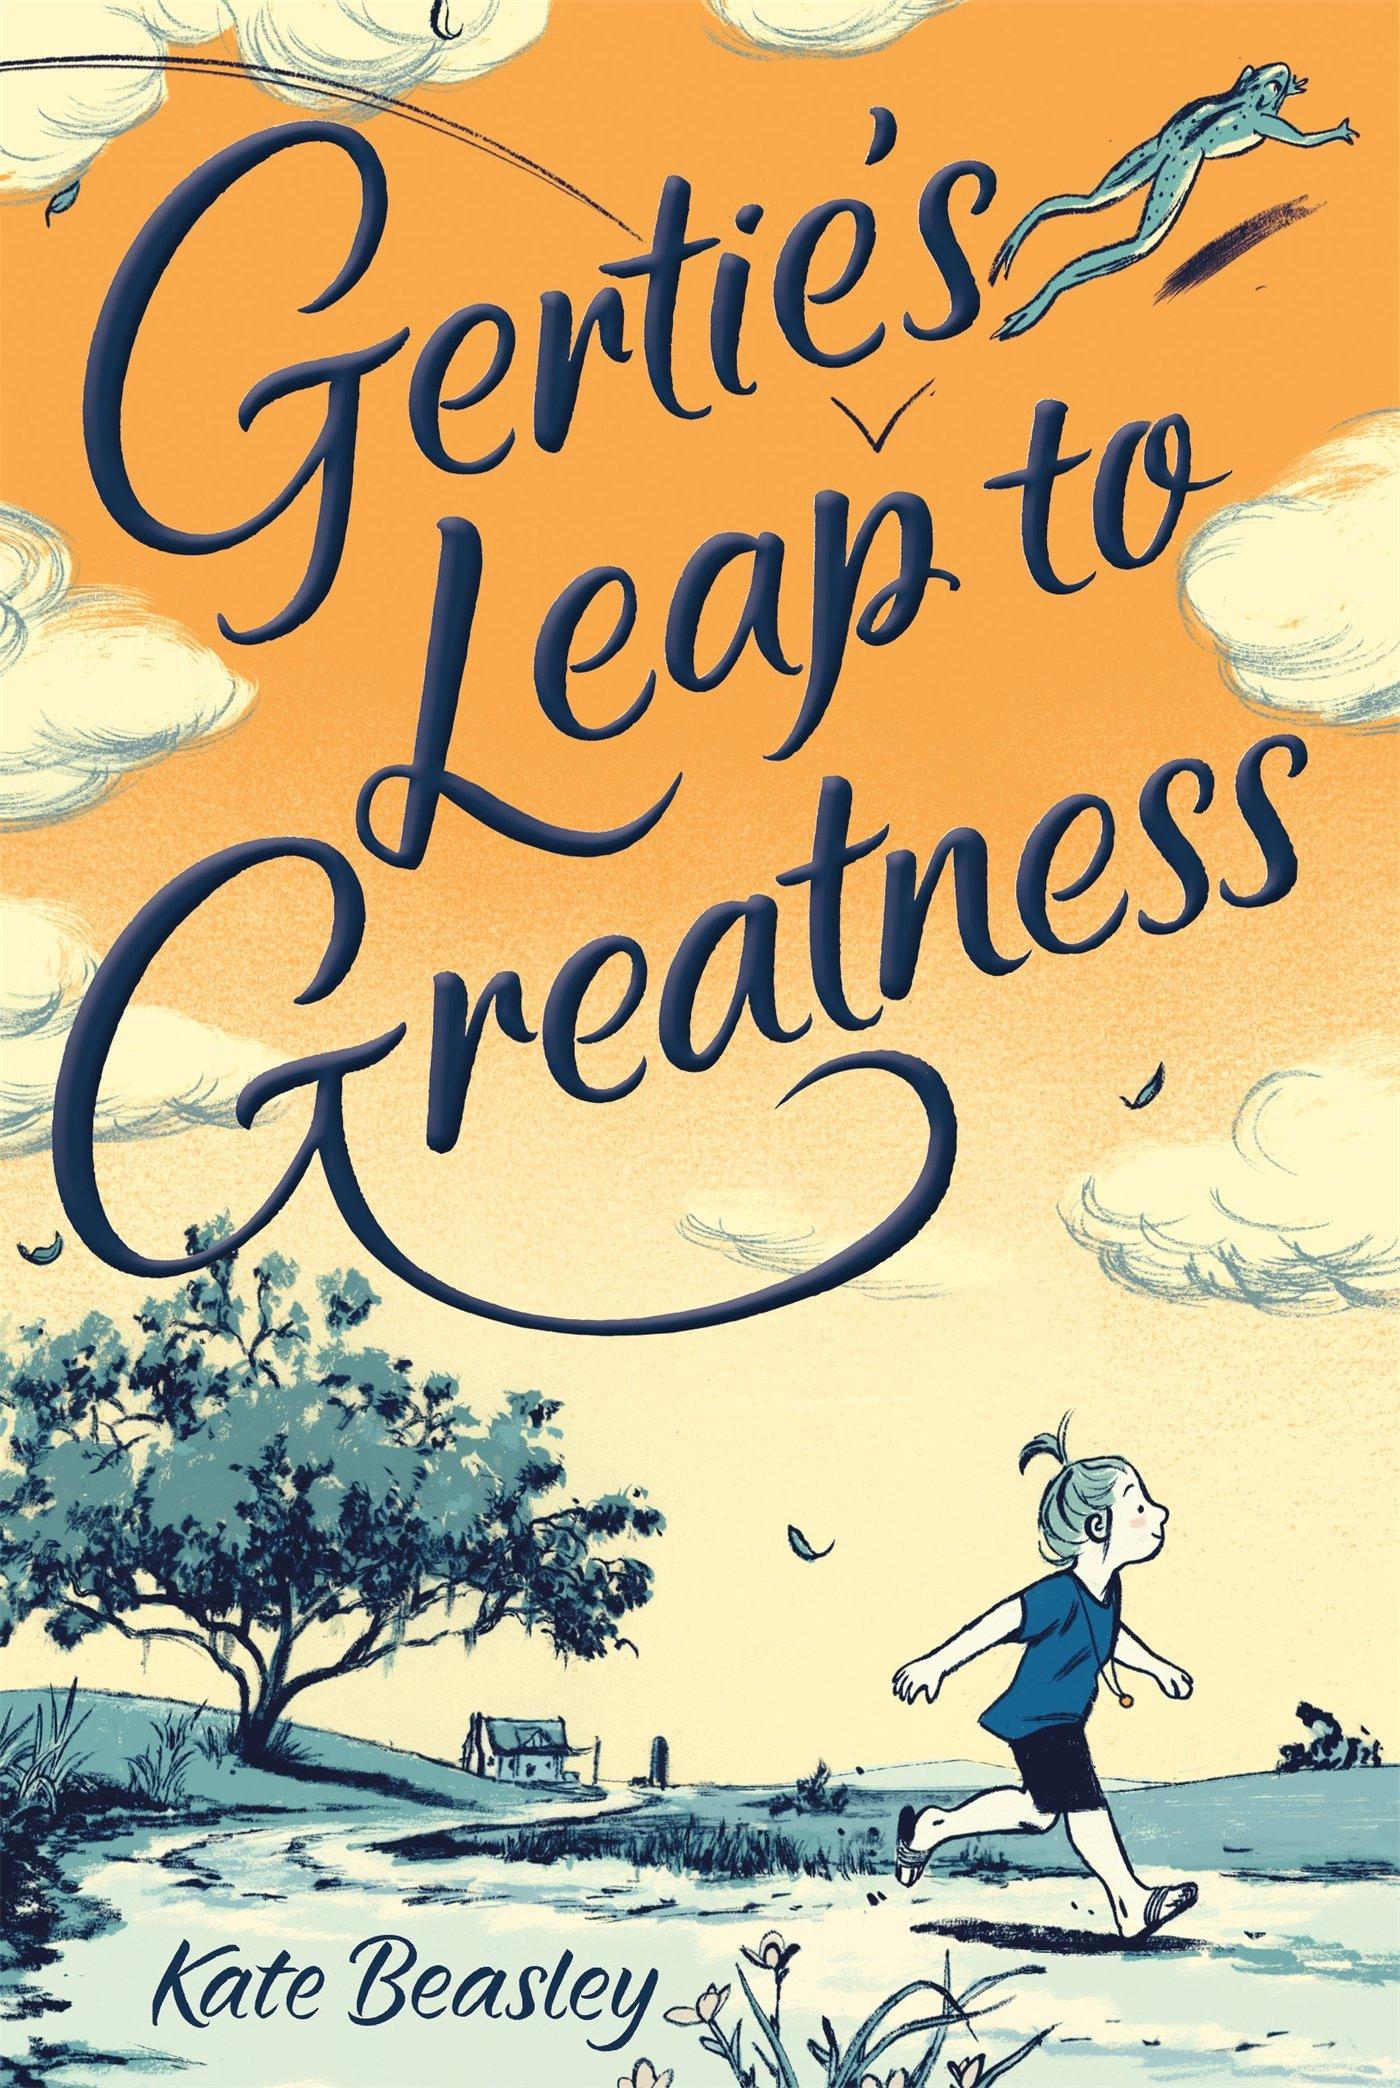 Gertie's Leap to Greatness: Kate Beasley, Jillian Tamaki